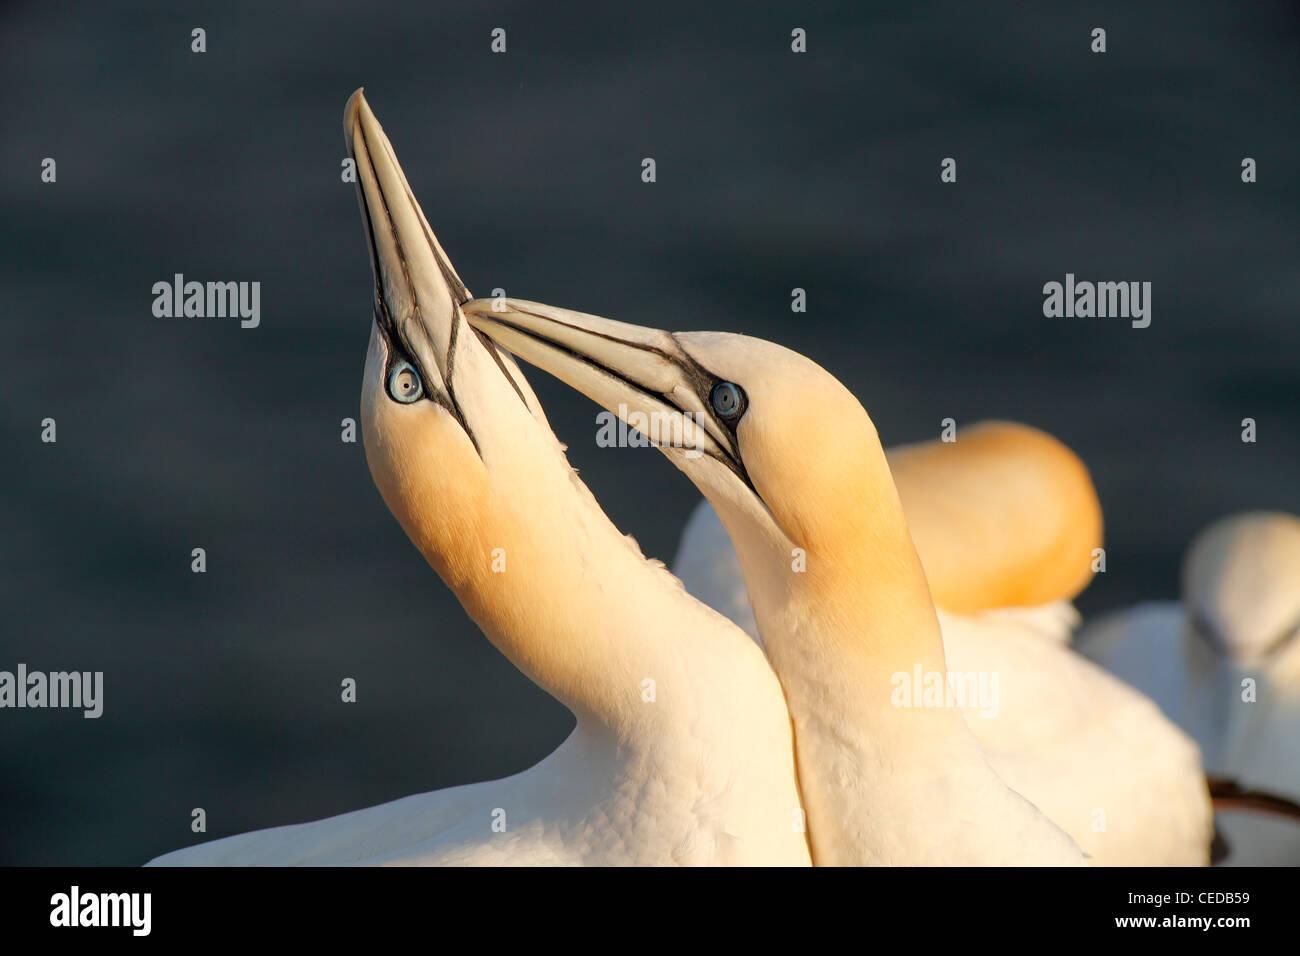 Northern gannets; Latin: Morus bassanus - Stock Image